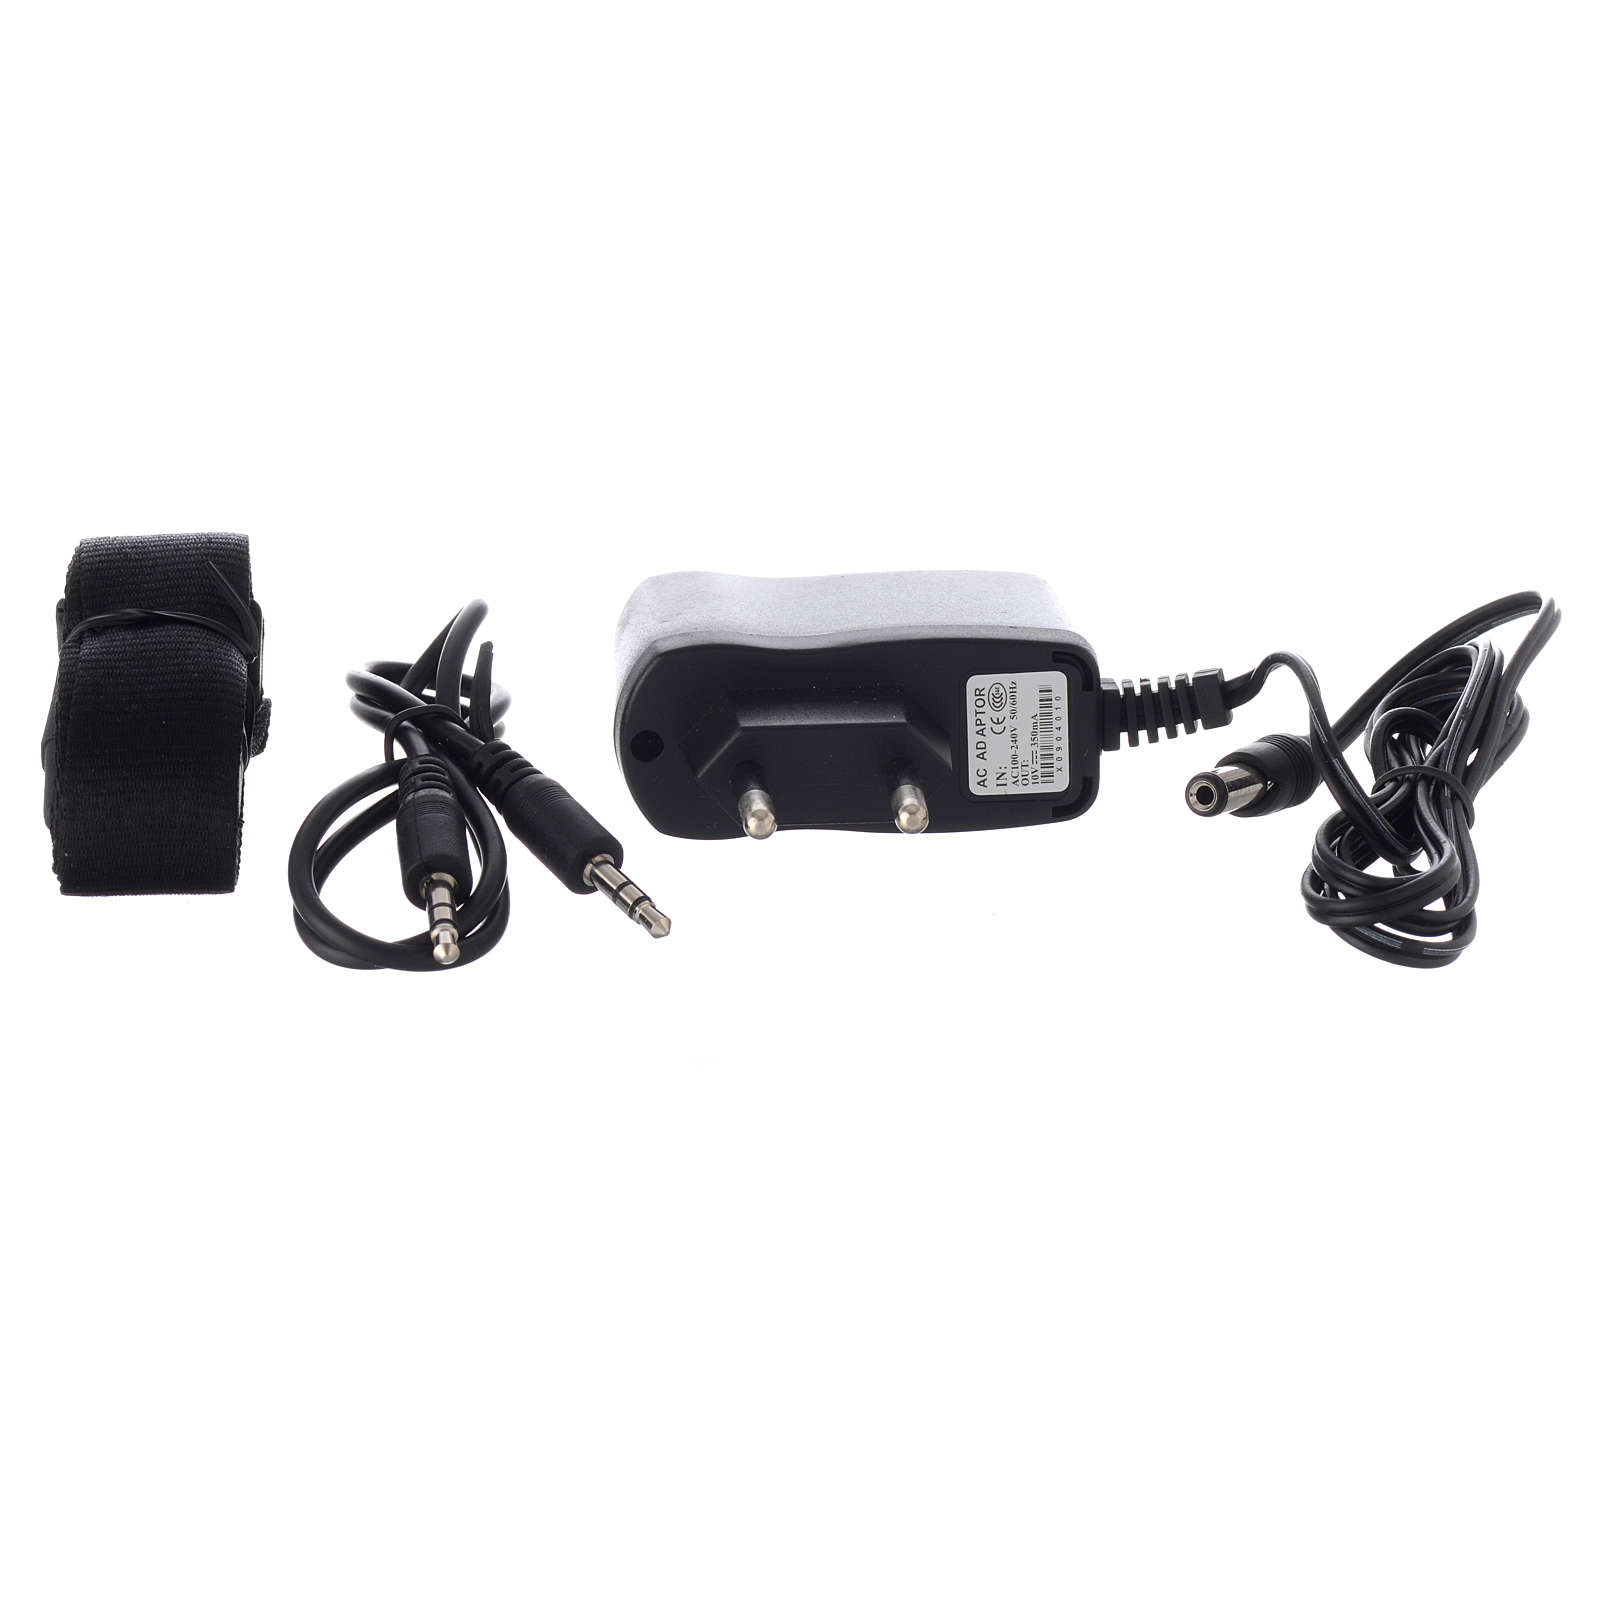 Portable amplifier for celebrations 3